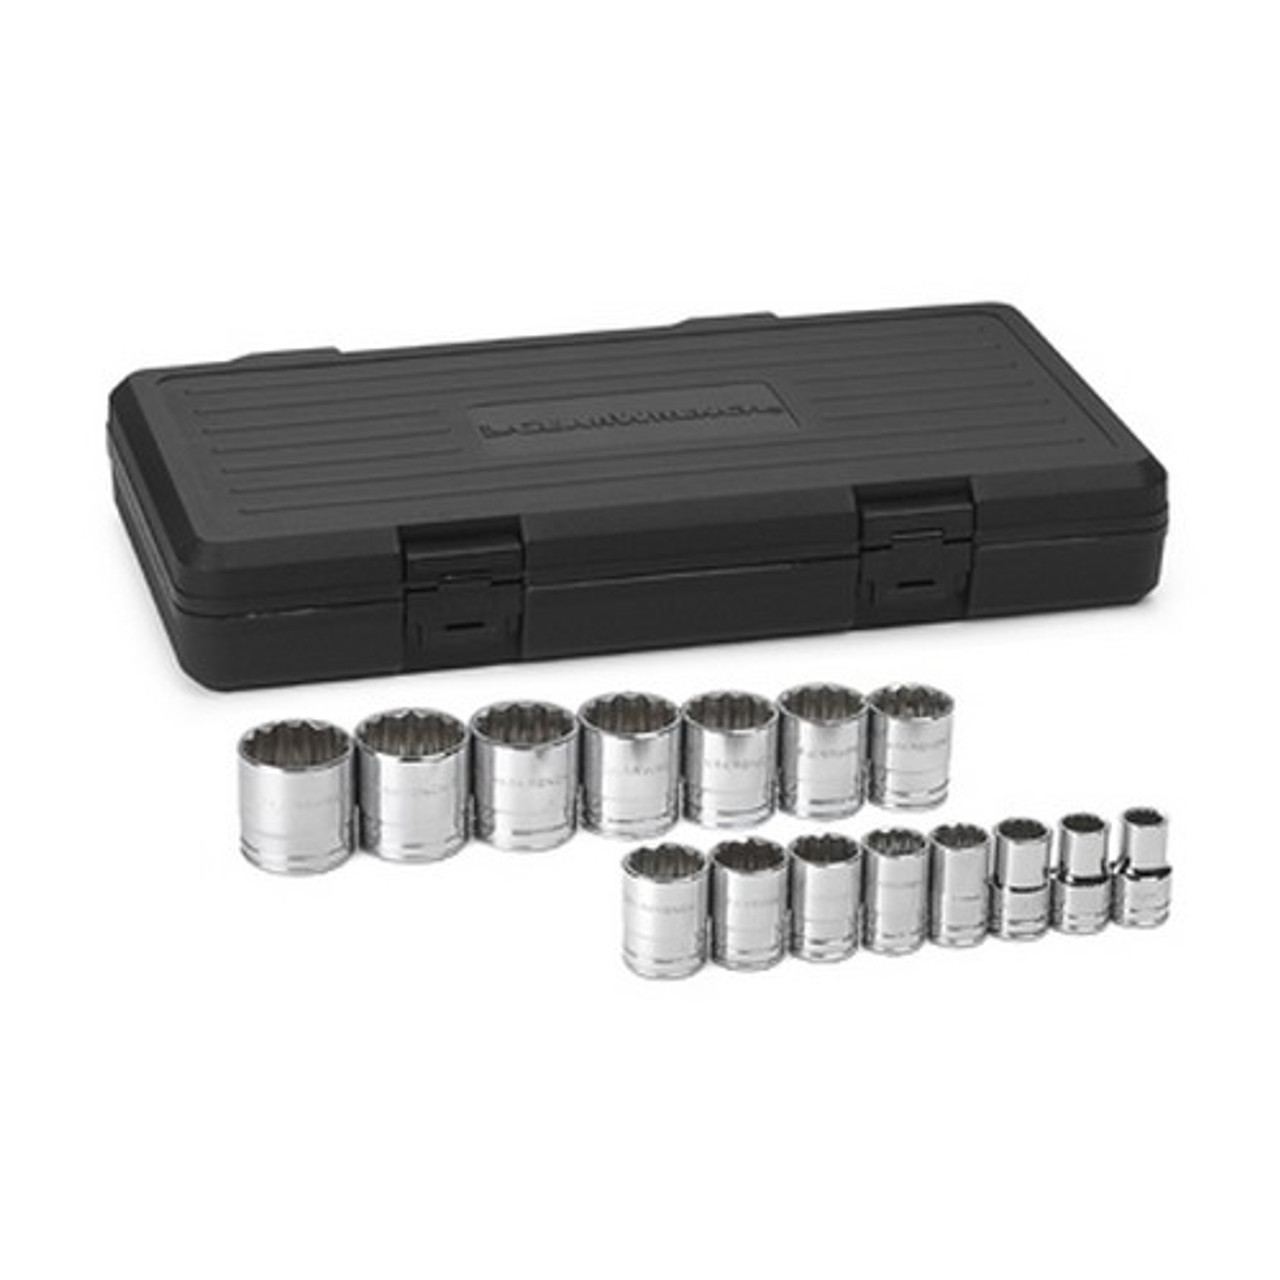 "Gearwrench 80706 15 piece 1//2/"" Drive SAE Socket Set"